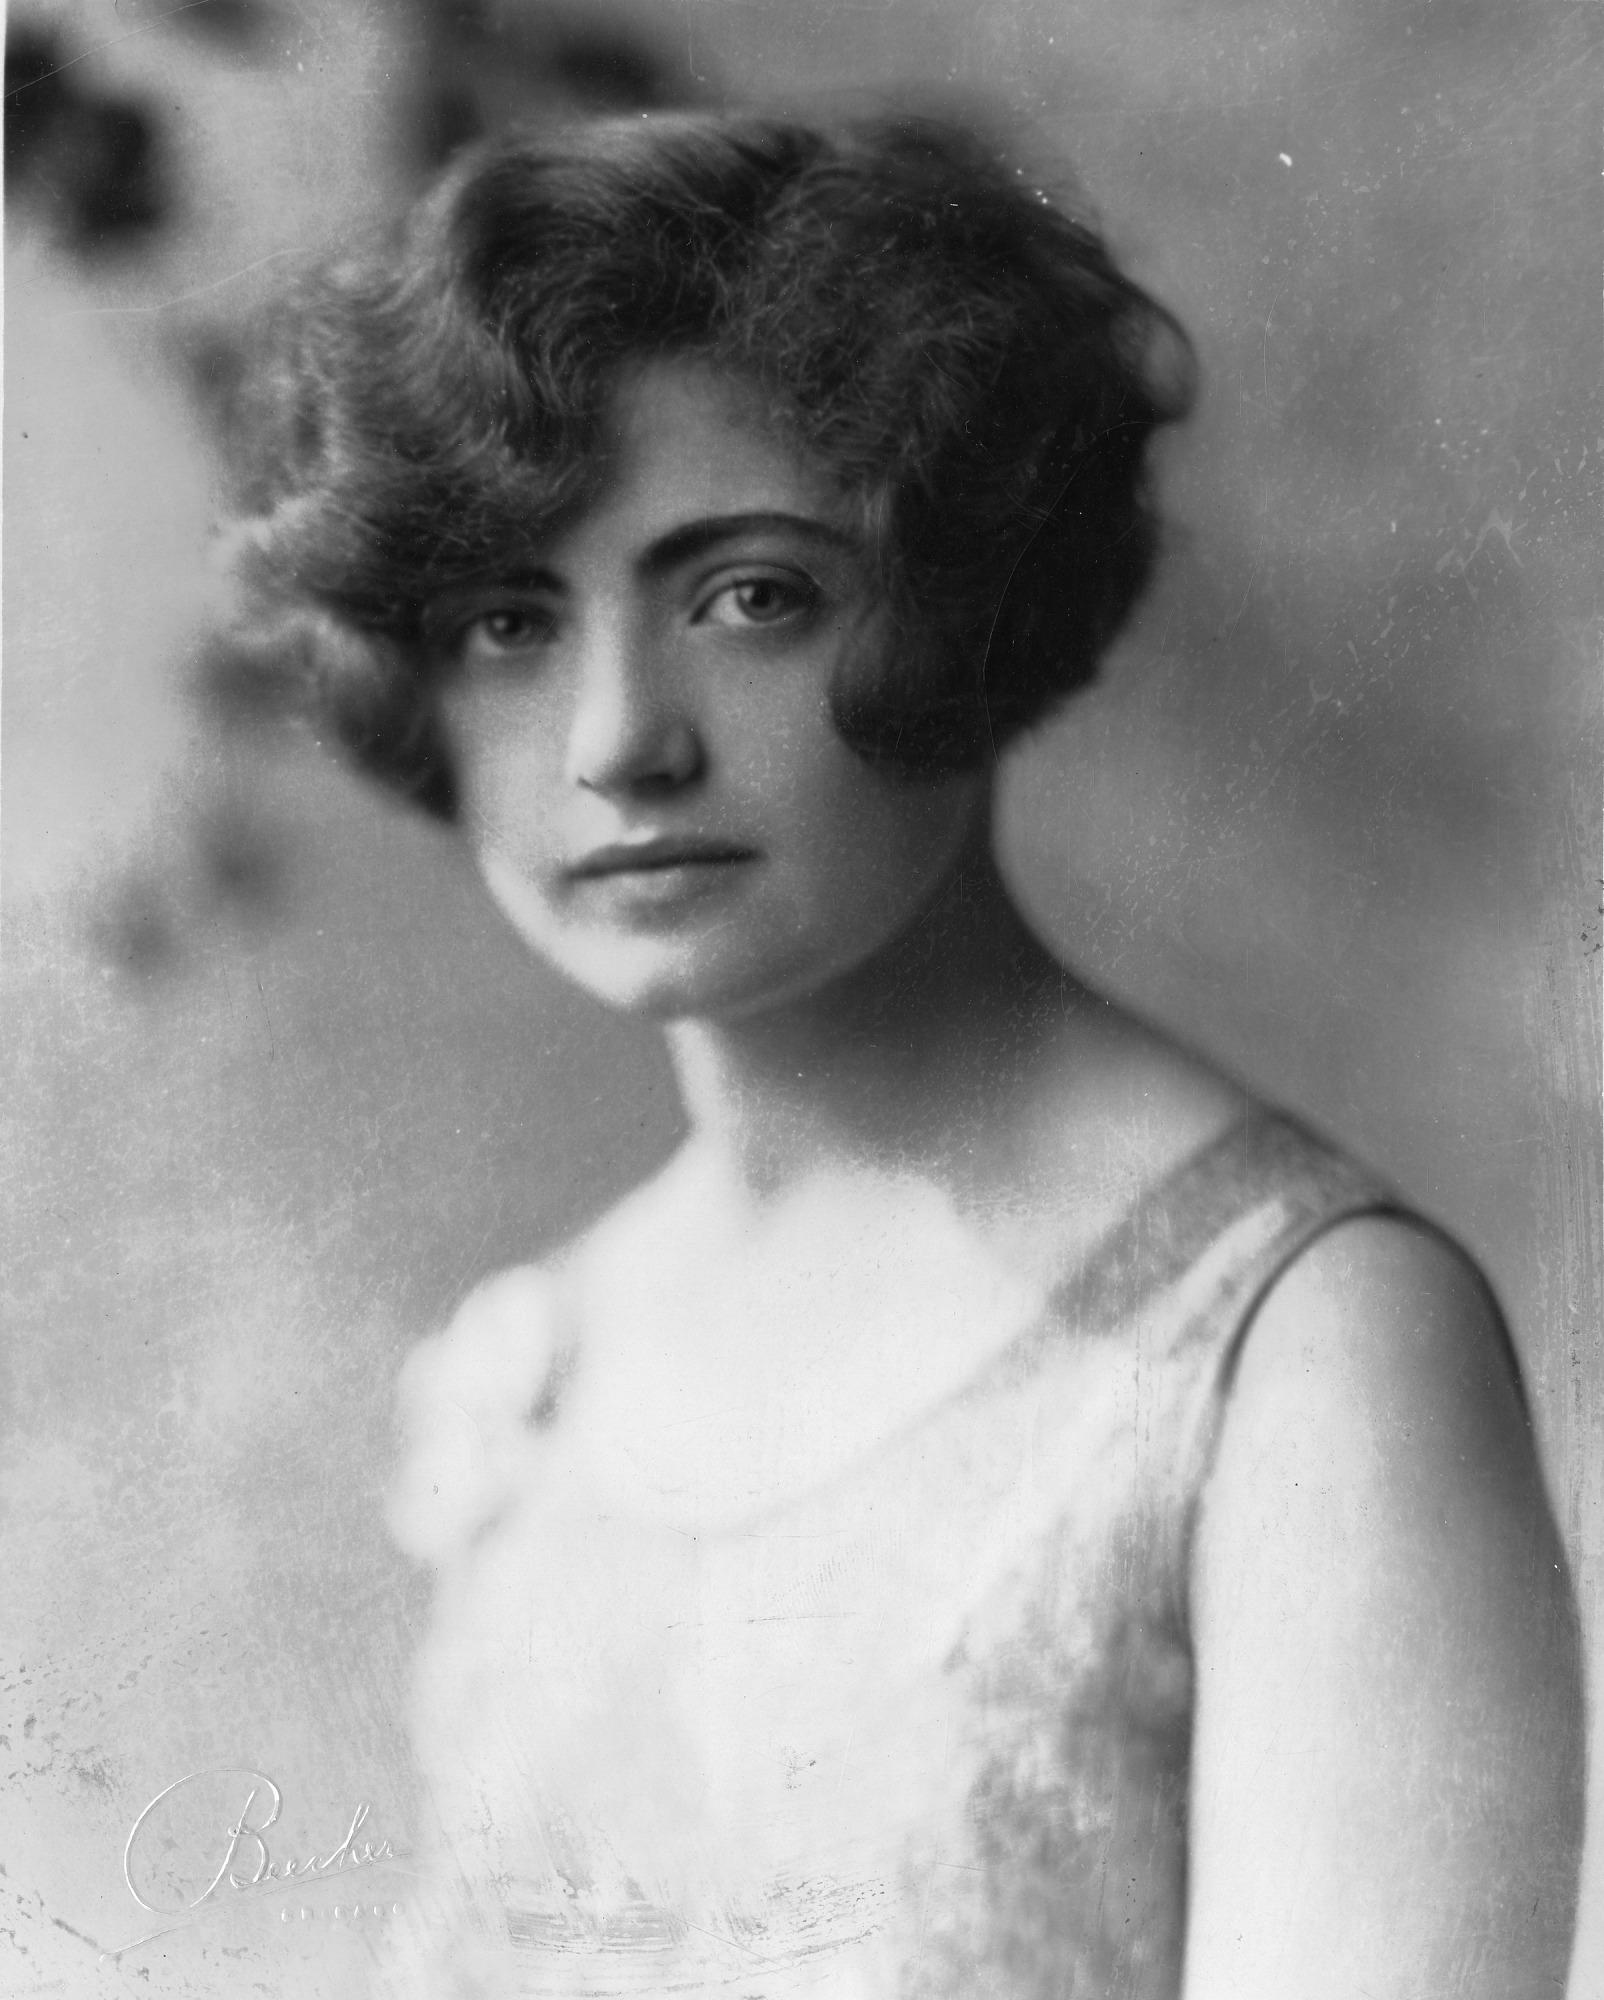 Dena Evelyn Shapiro [Joseph], Smithsonian Institution Archives, SIA Acc. 90-105 [SIA2009-3244].